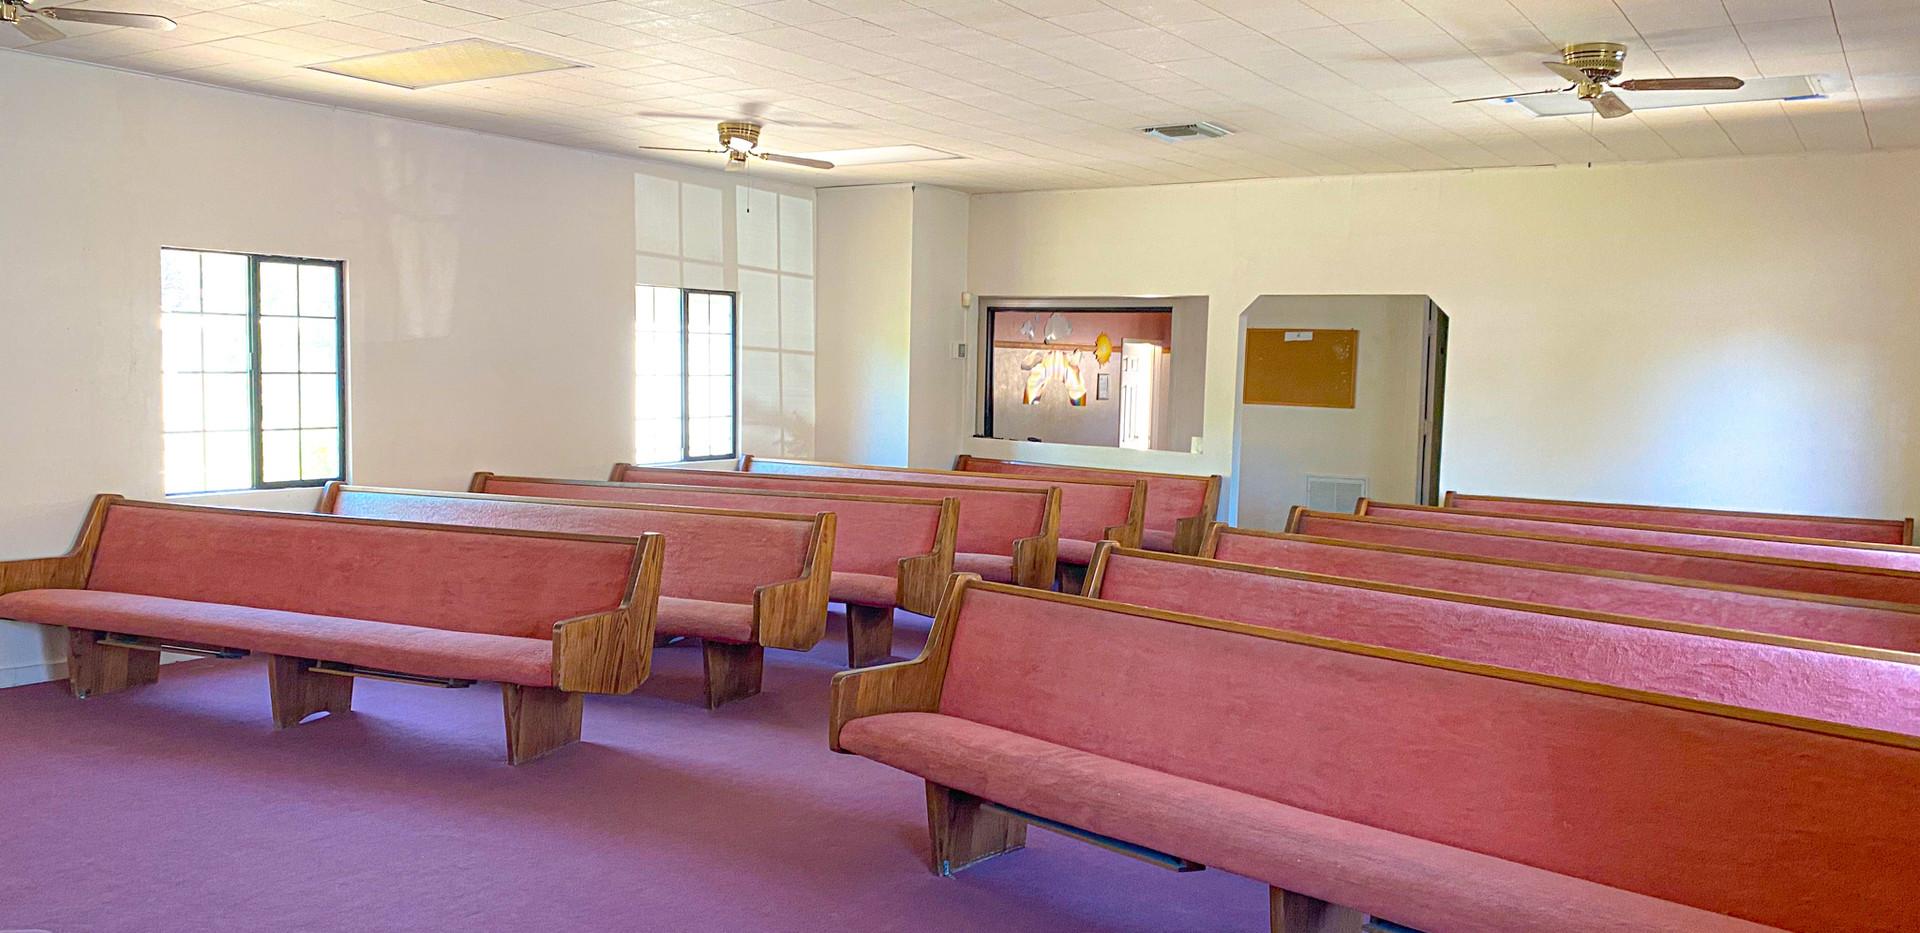 Leased Church